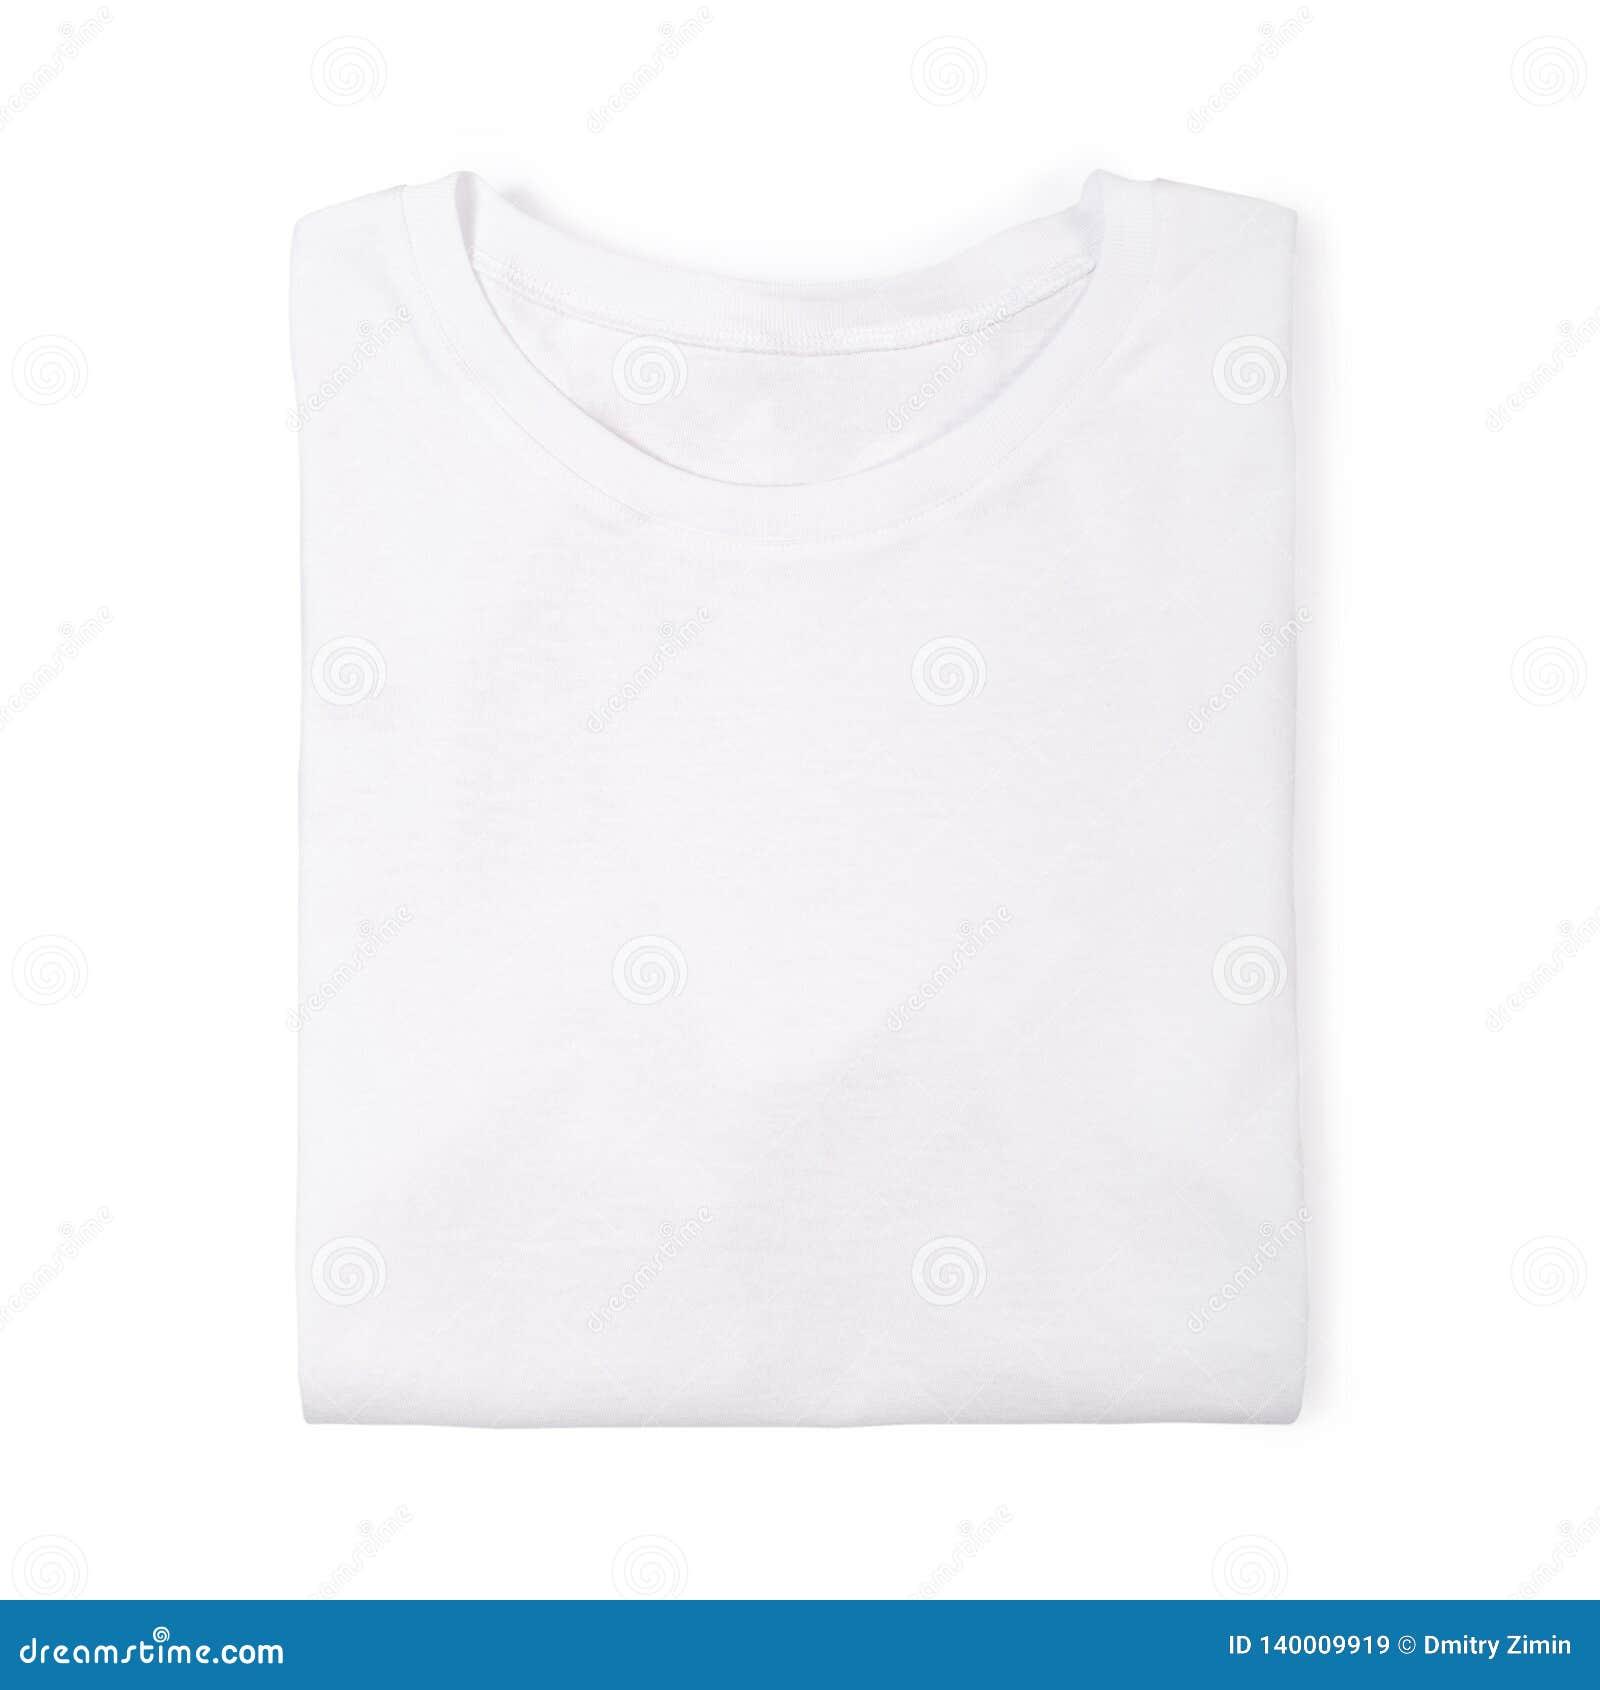 Camiseta doblada blanca aislada en blanco